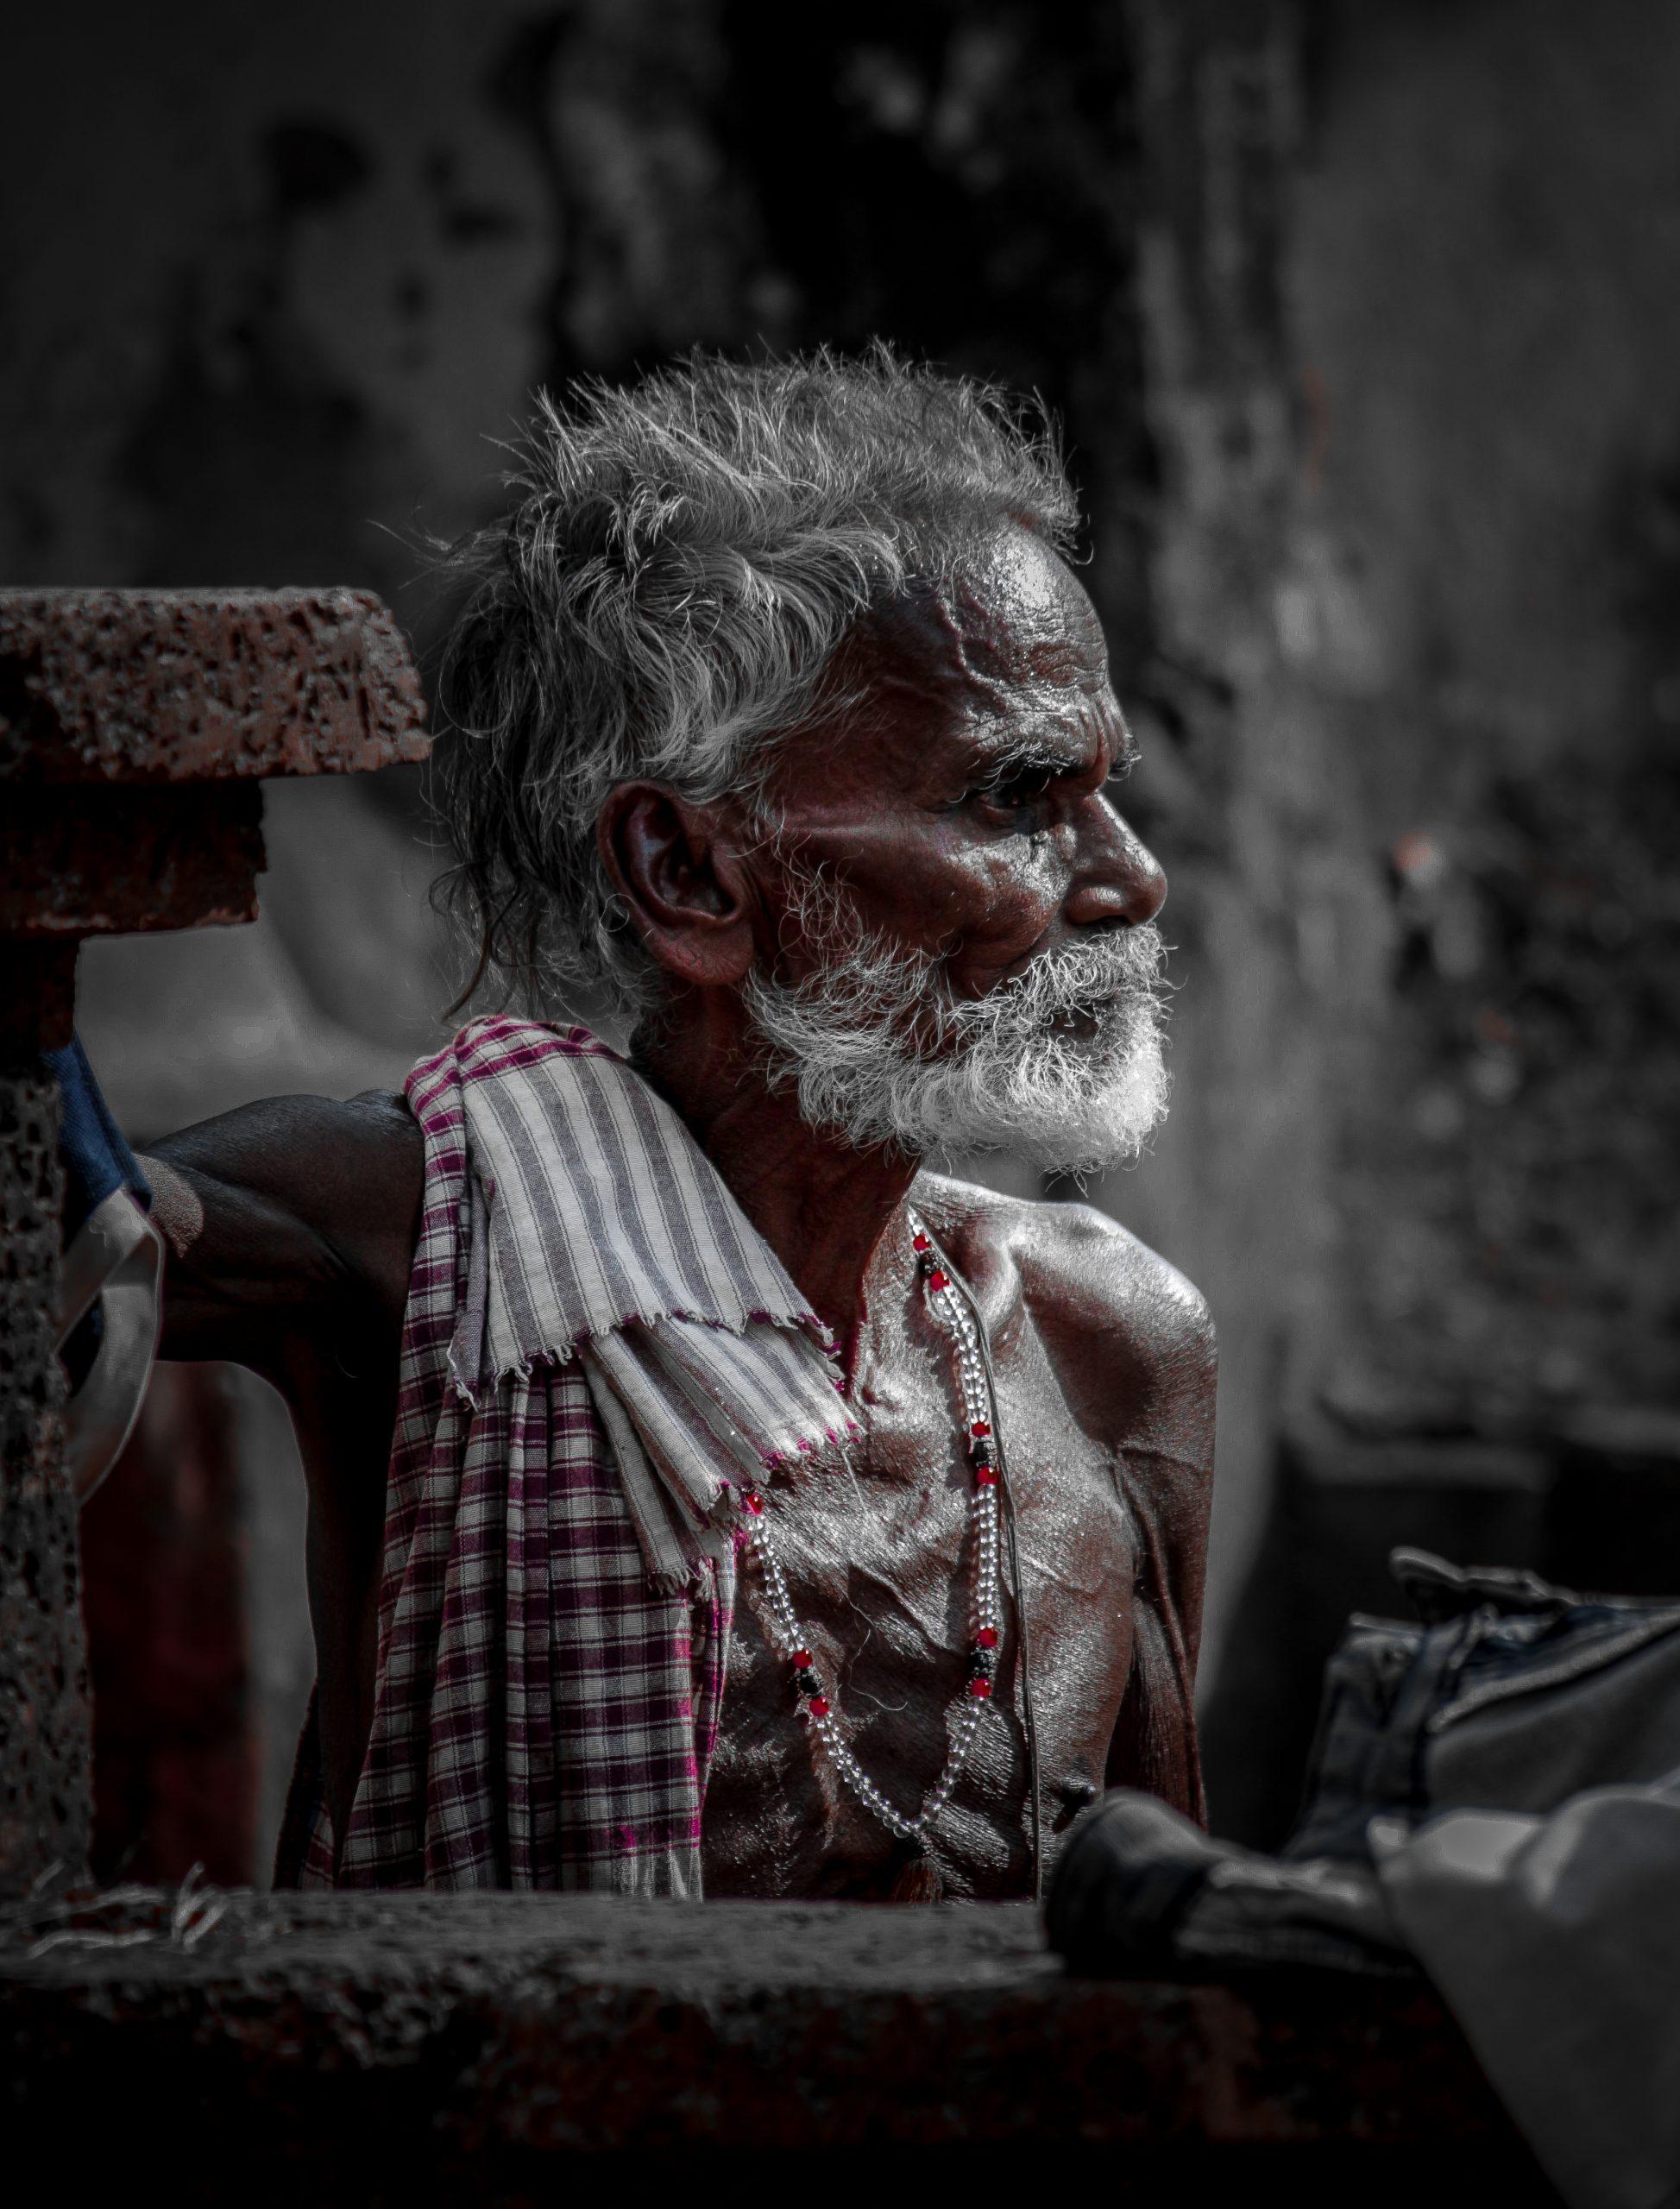 A poor oldman